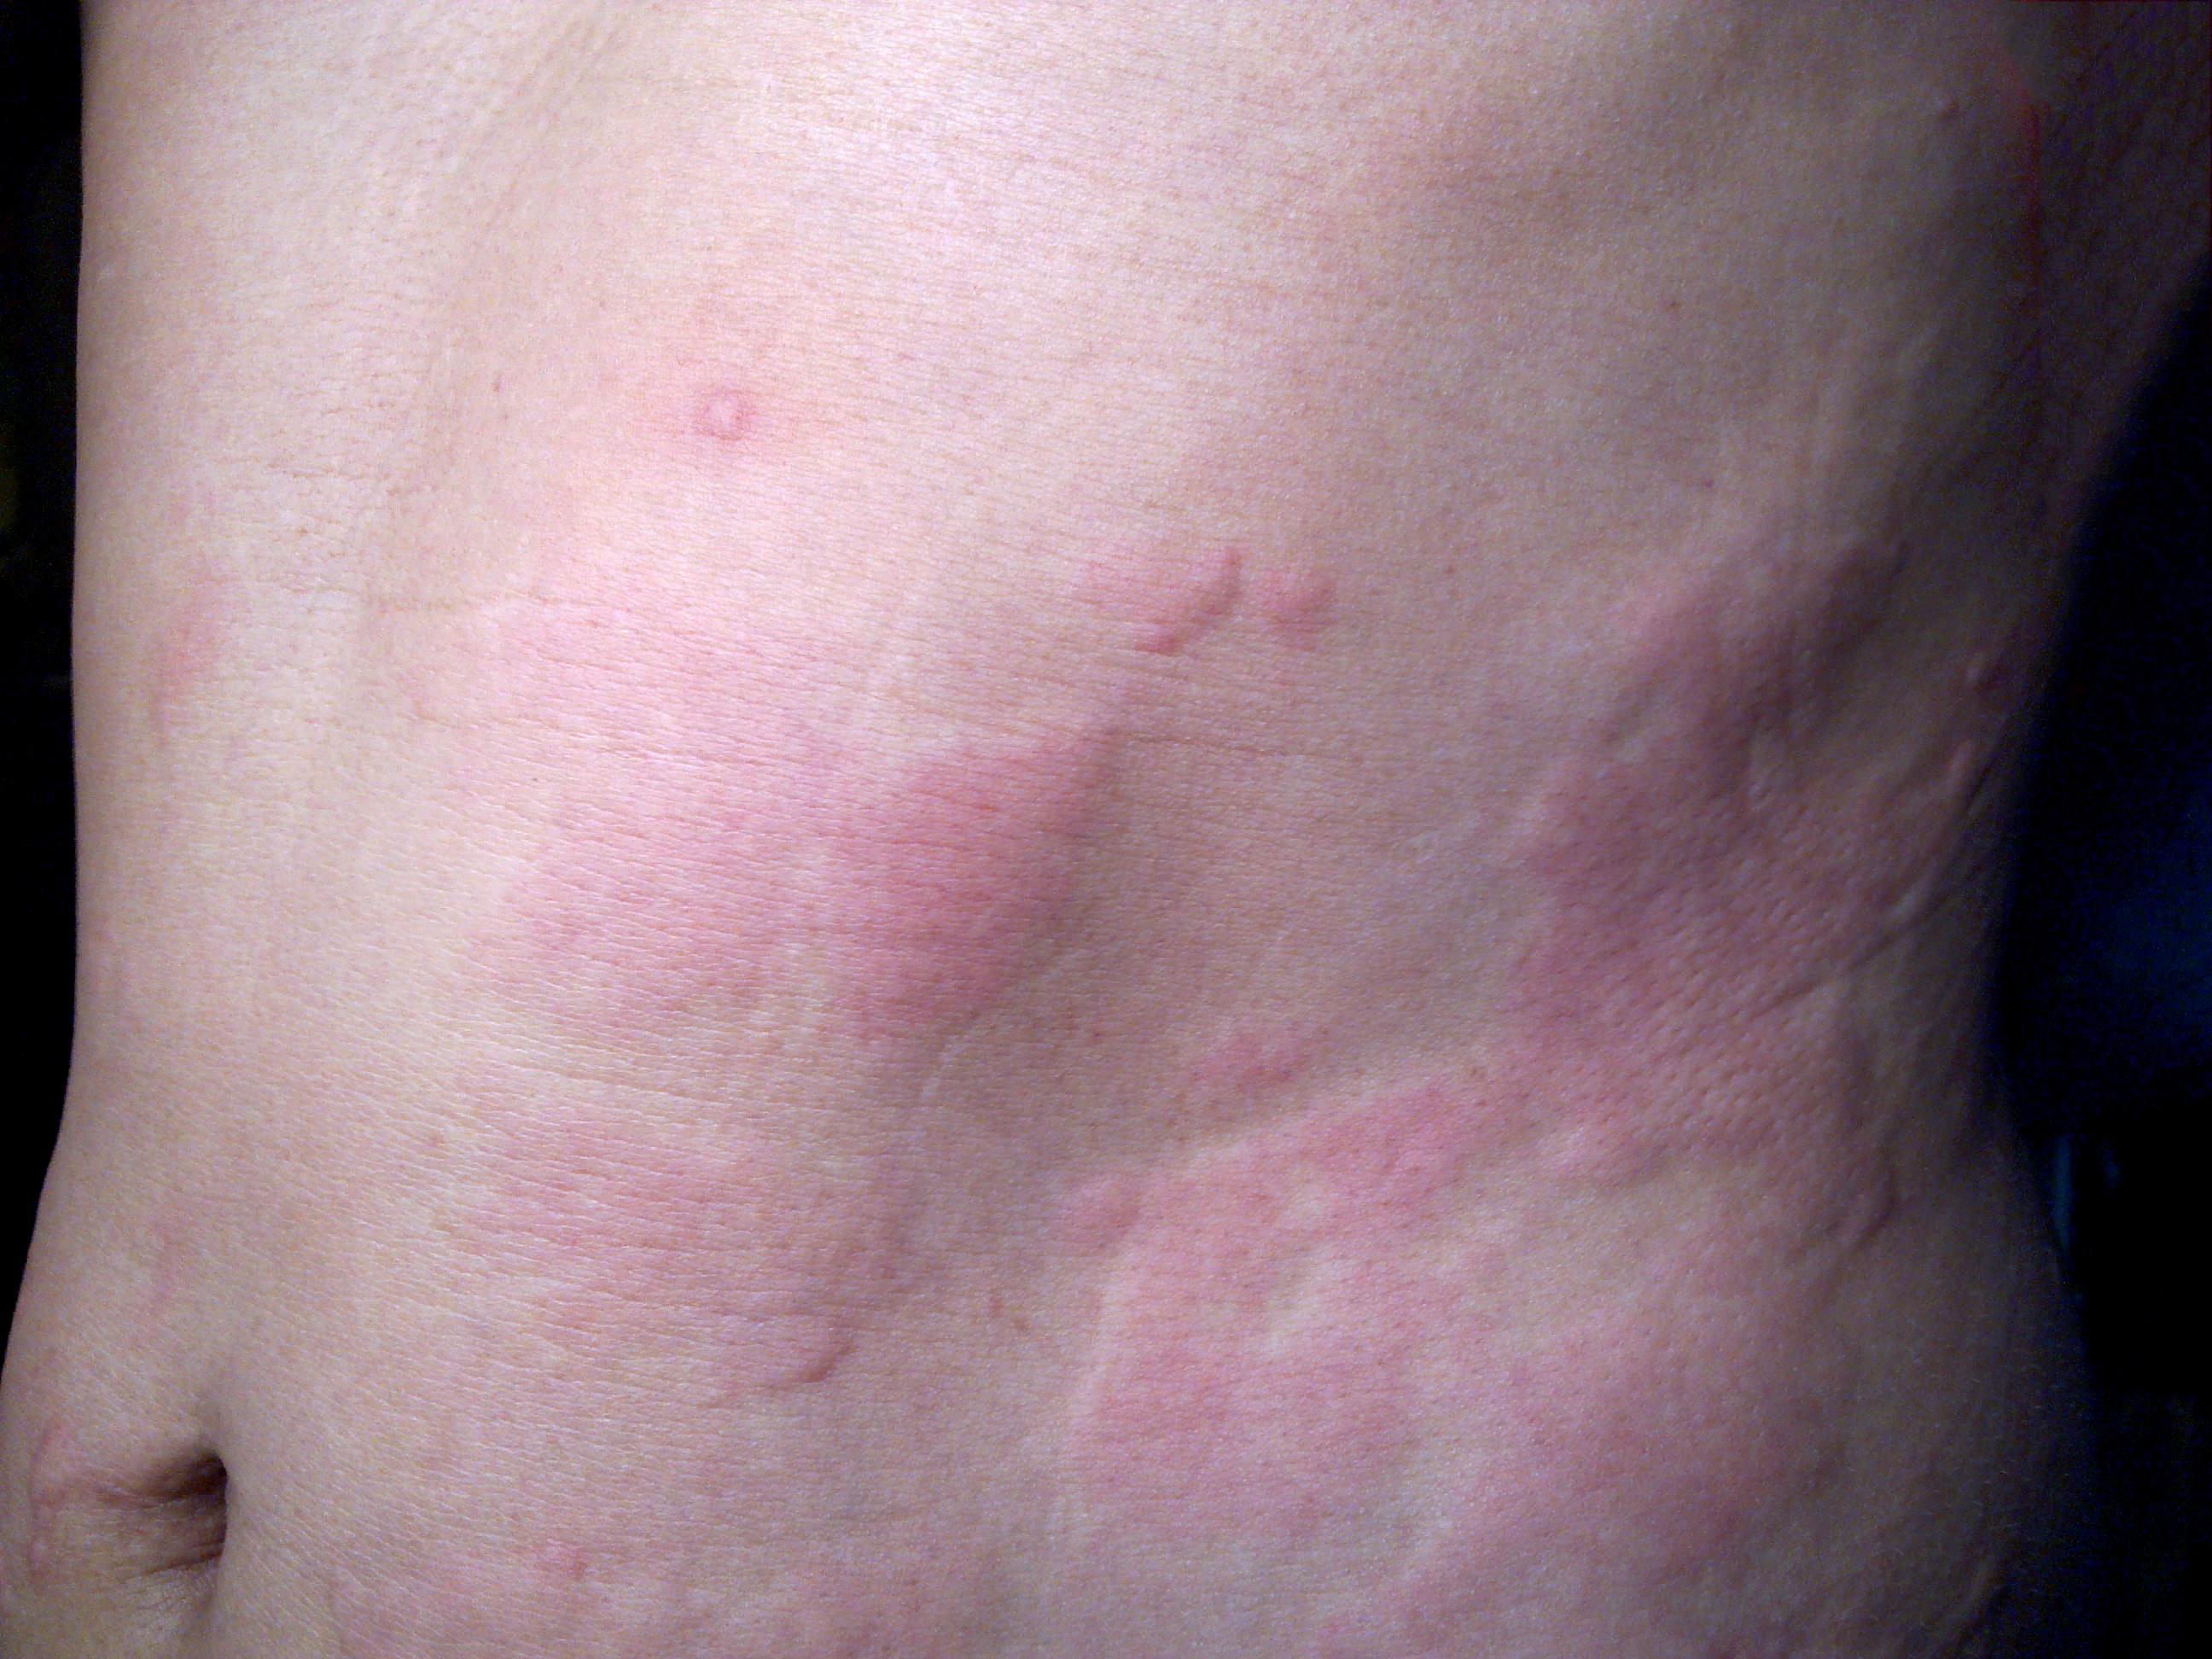 Pöttyök, foltok, csíkok: tünetek a bőrön - koronakredit.hu